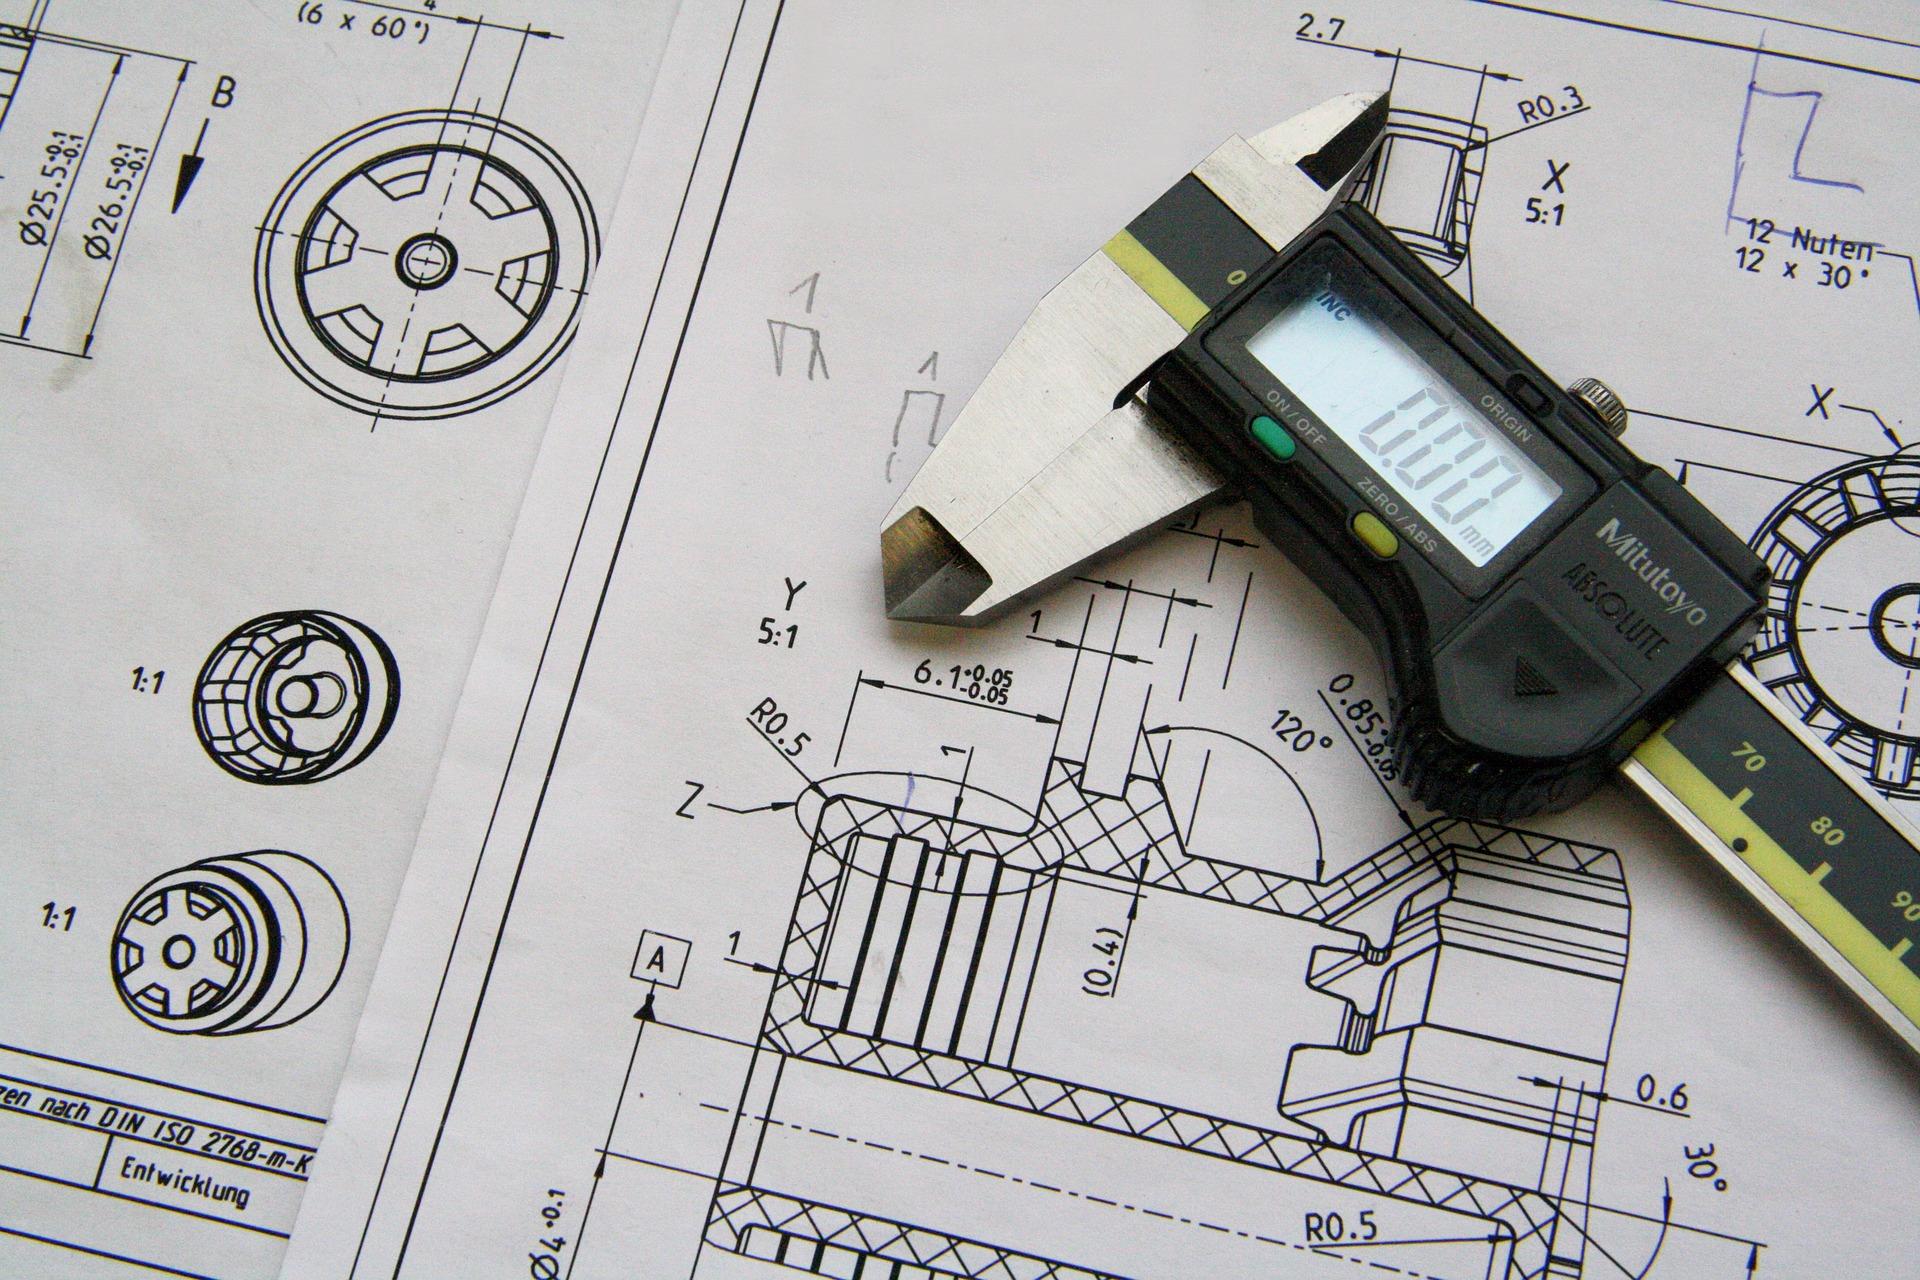 Cardboard Helicopter Product Design Cleveland Ohio Product Development Engineering website image12.jpg